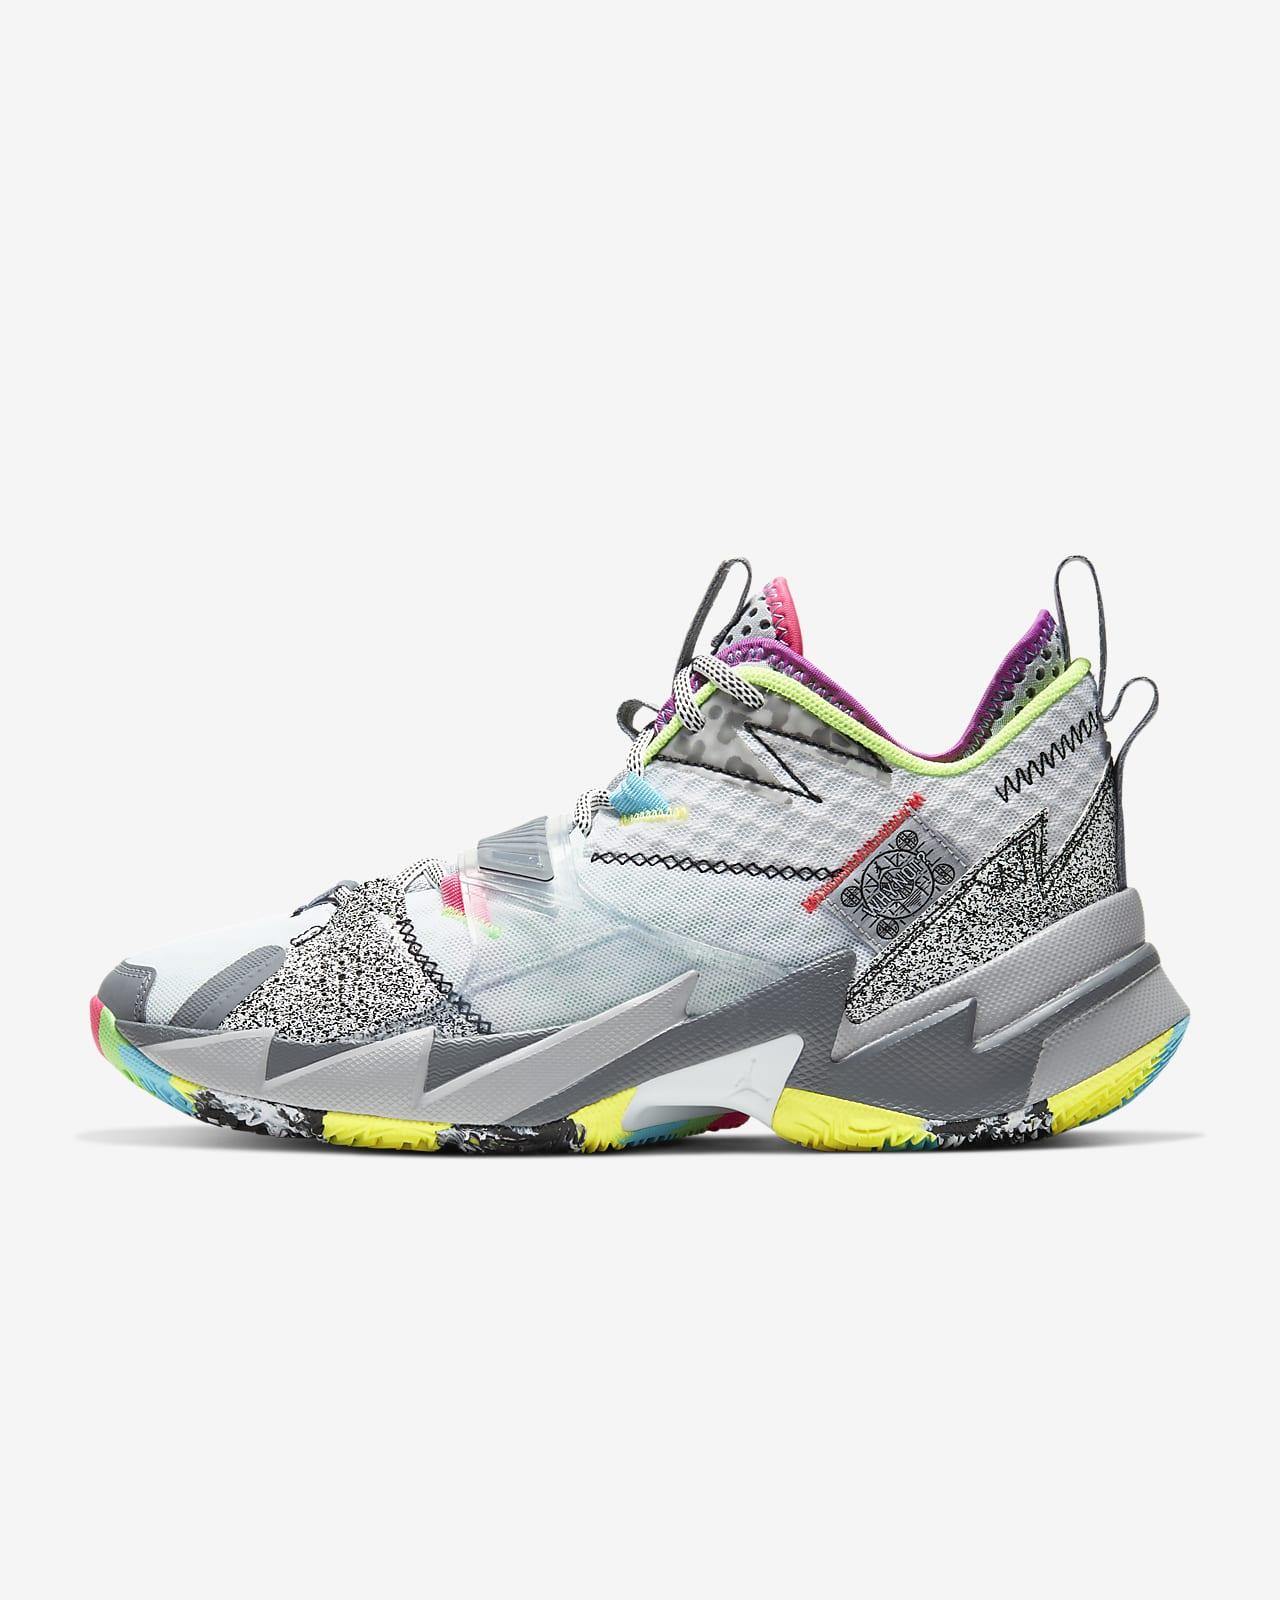 Zer0 3 Basketball Shoe Nike Id